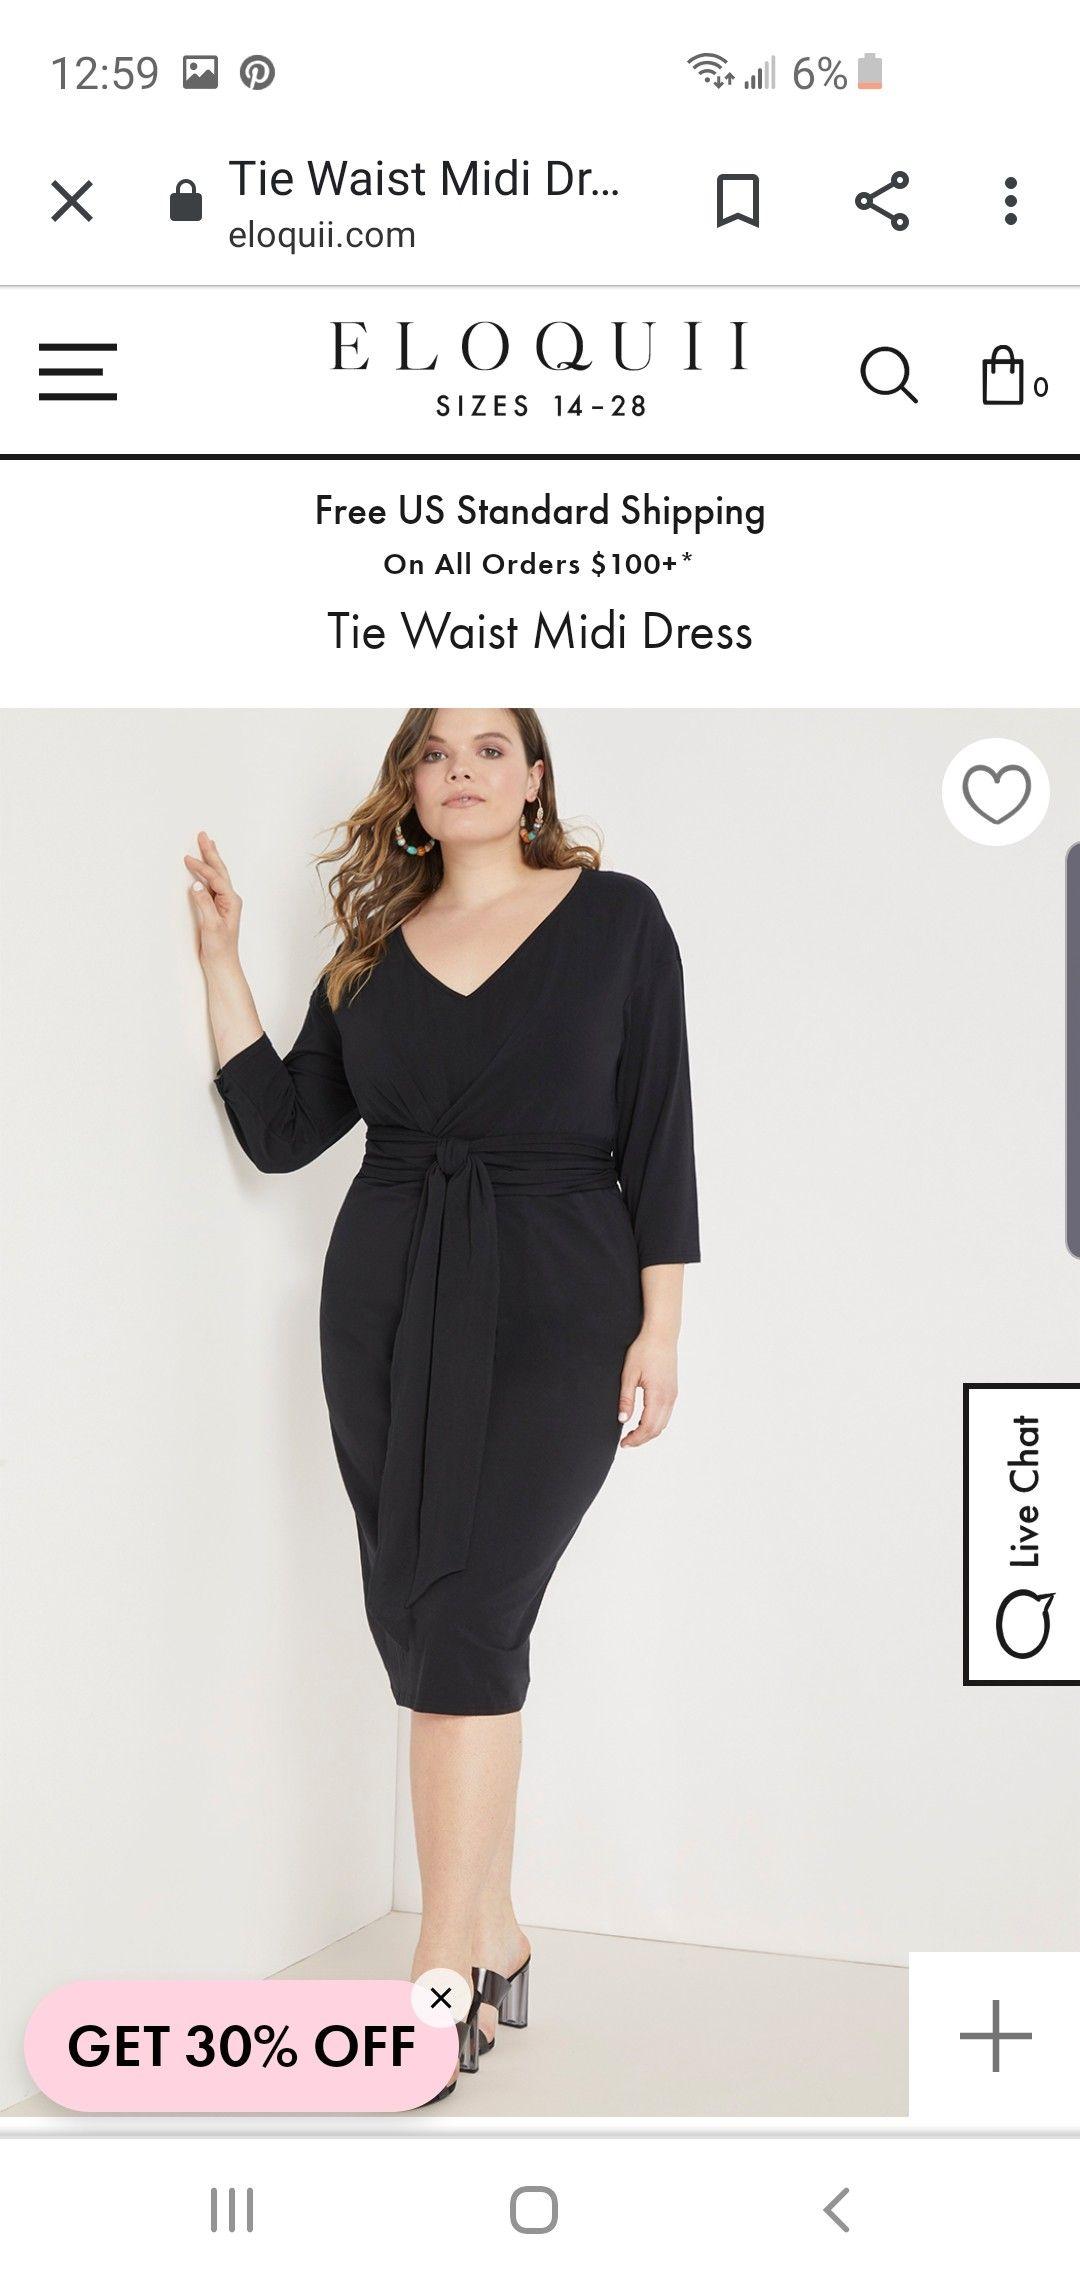 Pin By Rachii Sig On For Gabs When She Is Ready Little Black Dress Midi Dress Black Dress [ 2280 x 1080 Pixel ]